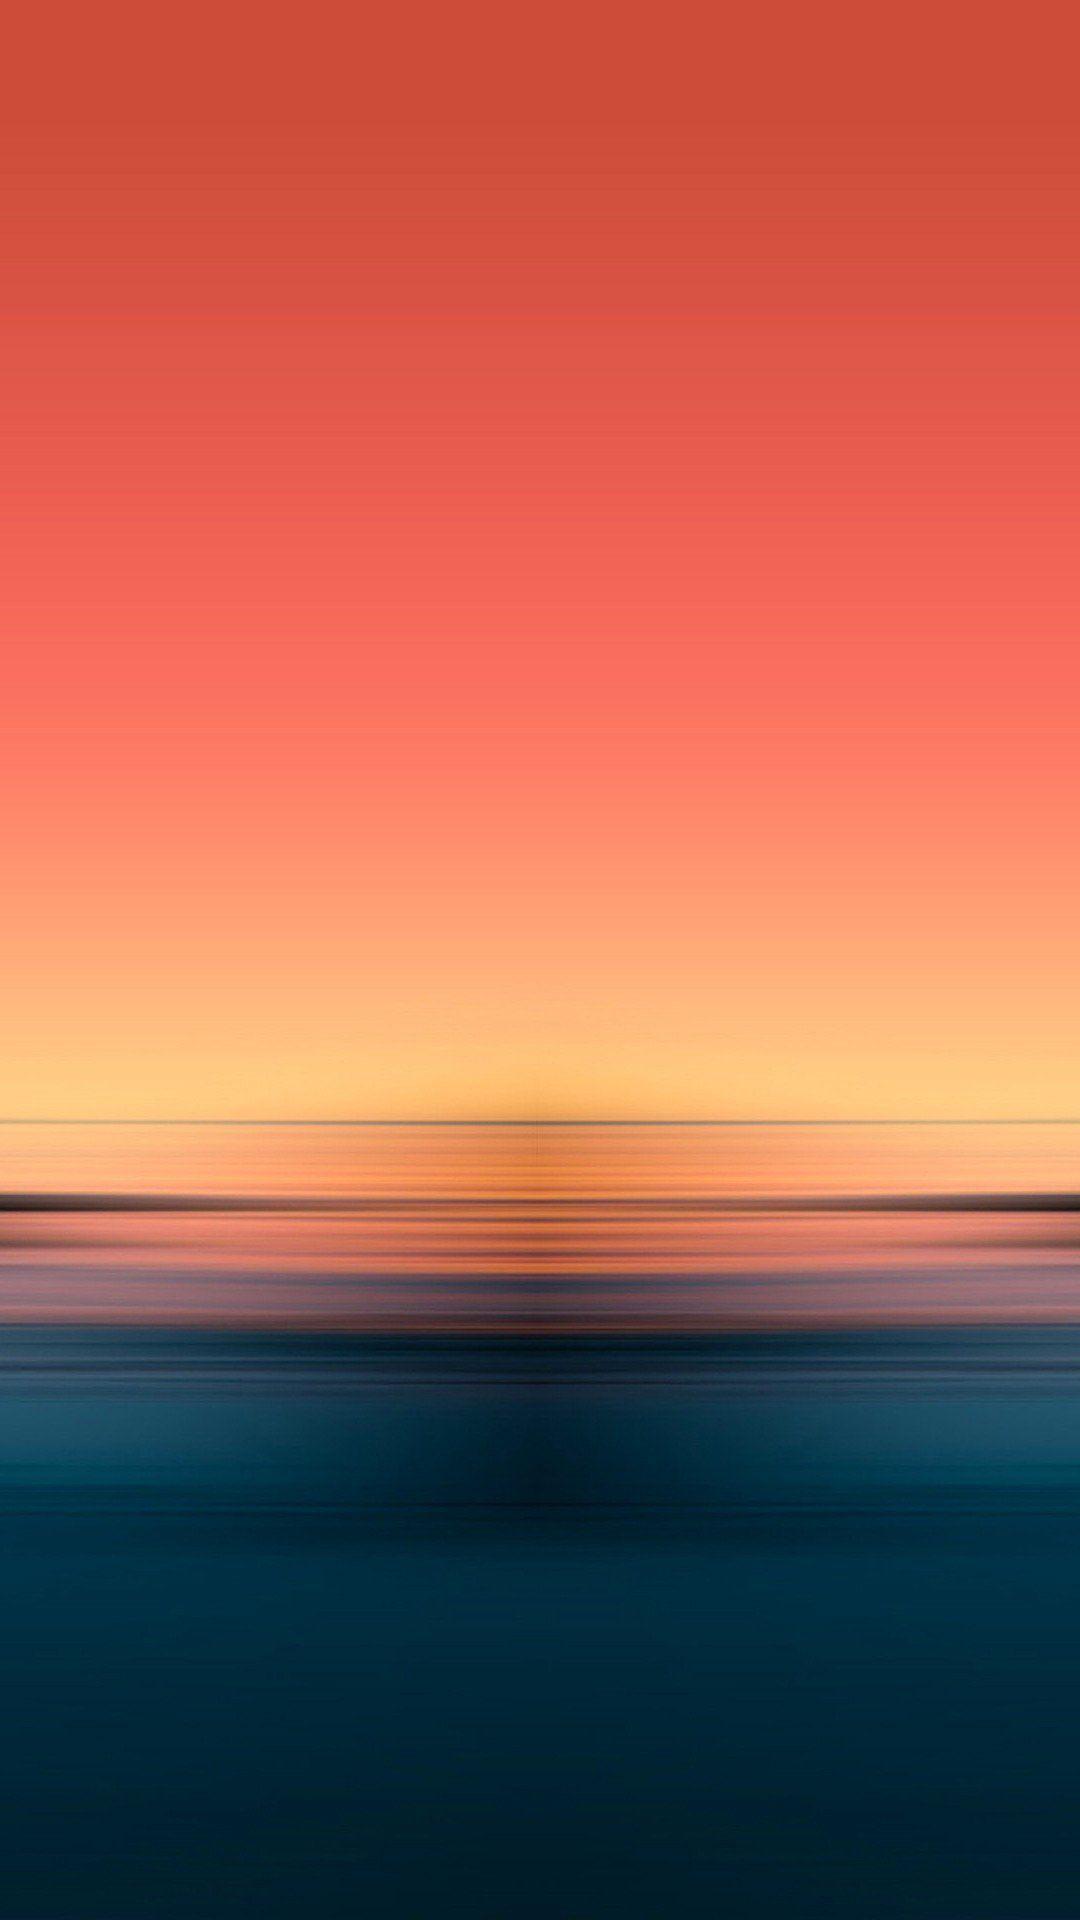 Evening color gradient blurred landscape visual Wallpaper Background Evening color gradient blurred landscape visual Wallpaper Background